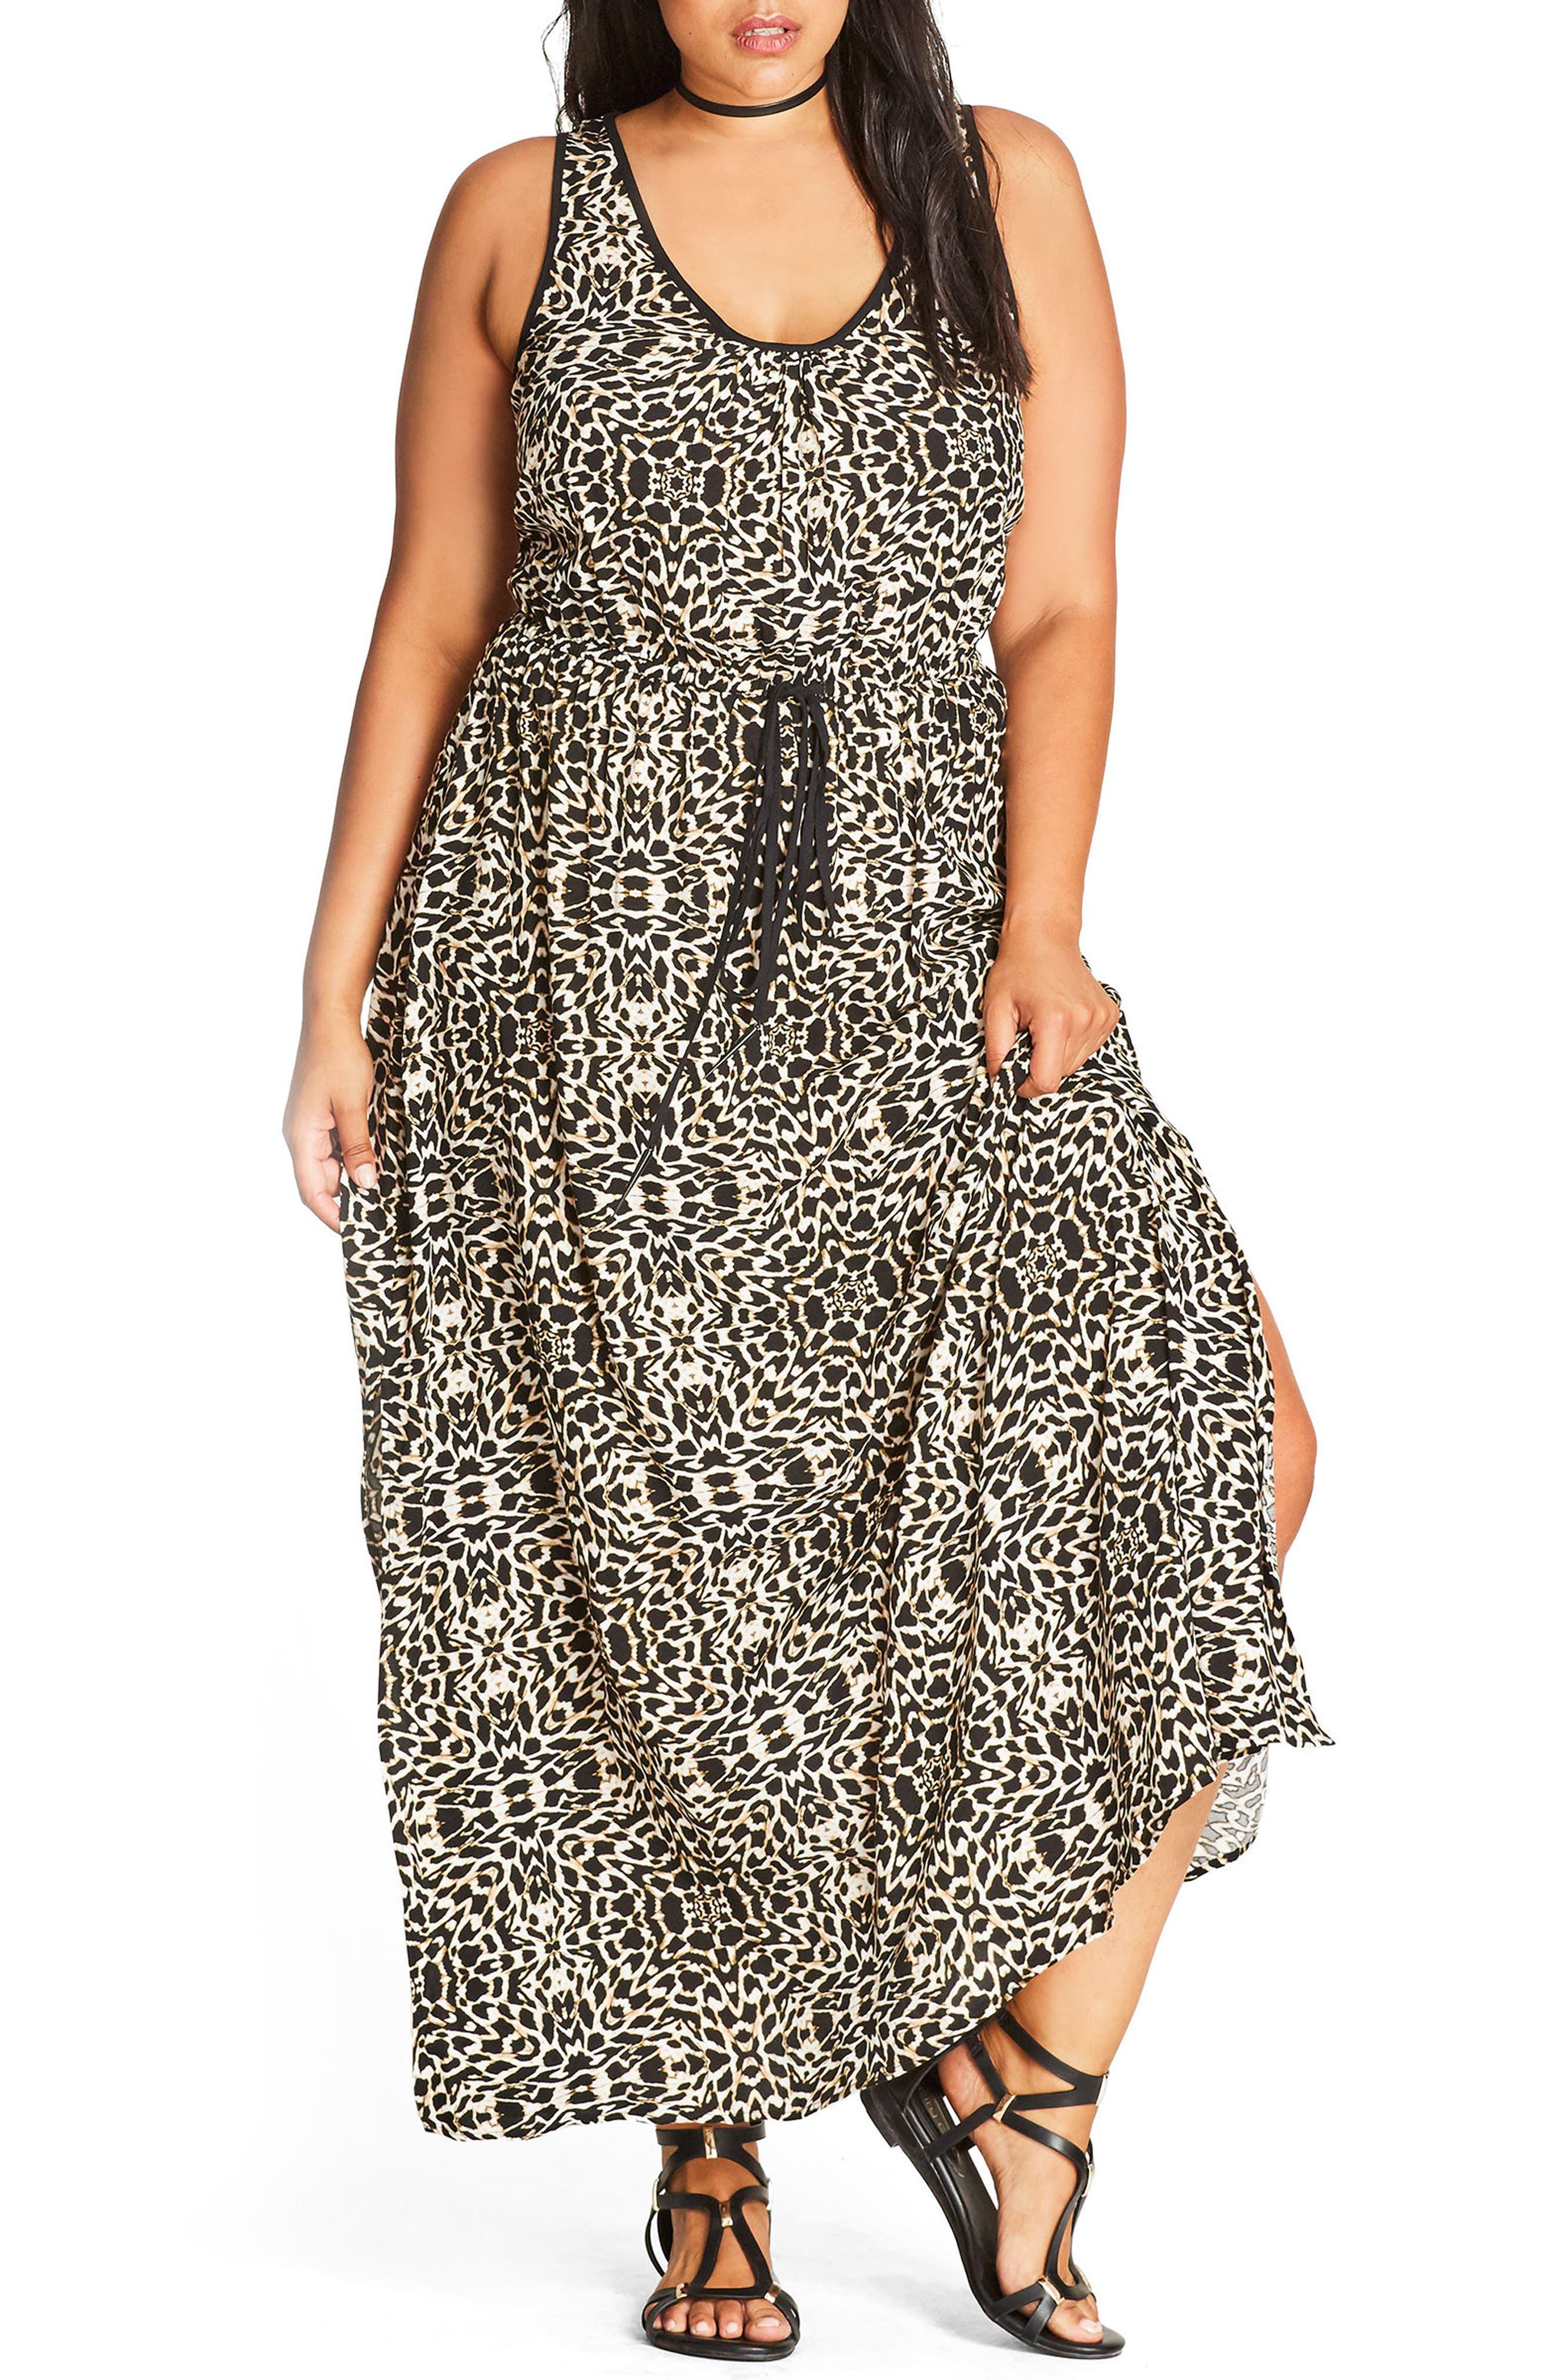 City Chic Summer Party Maxi Dress (Plus Size)